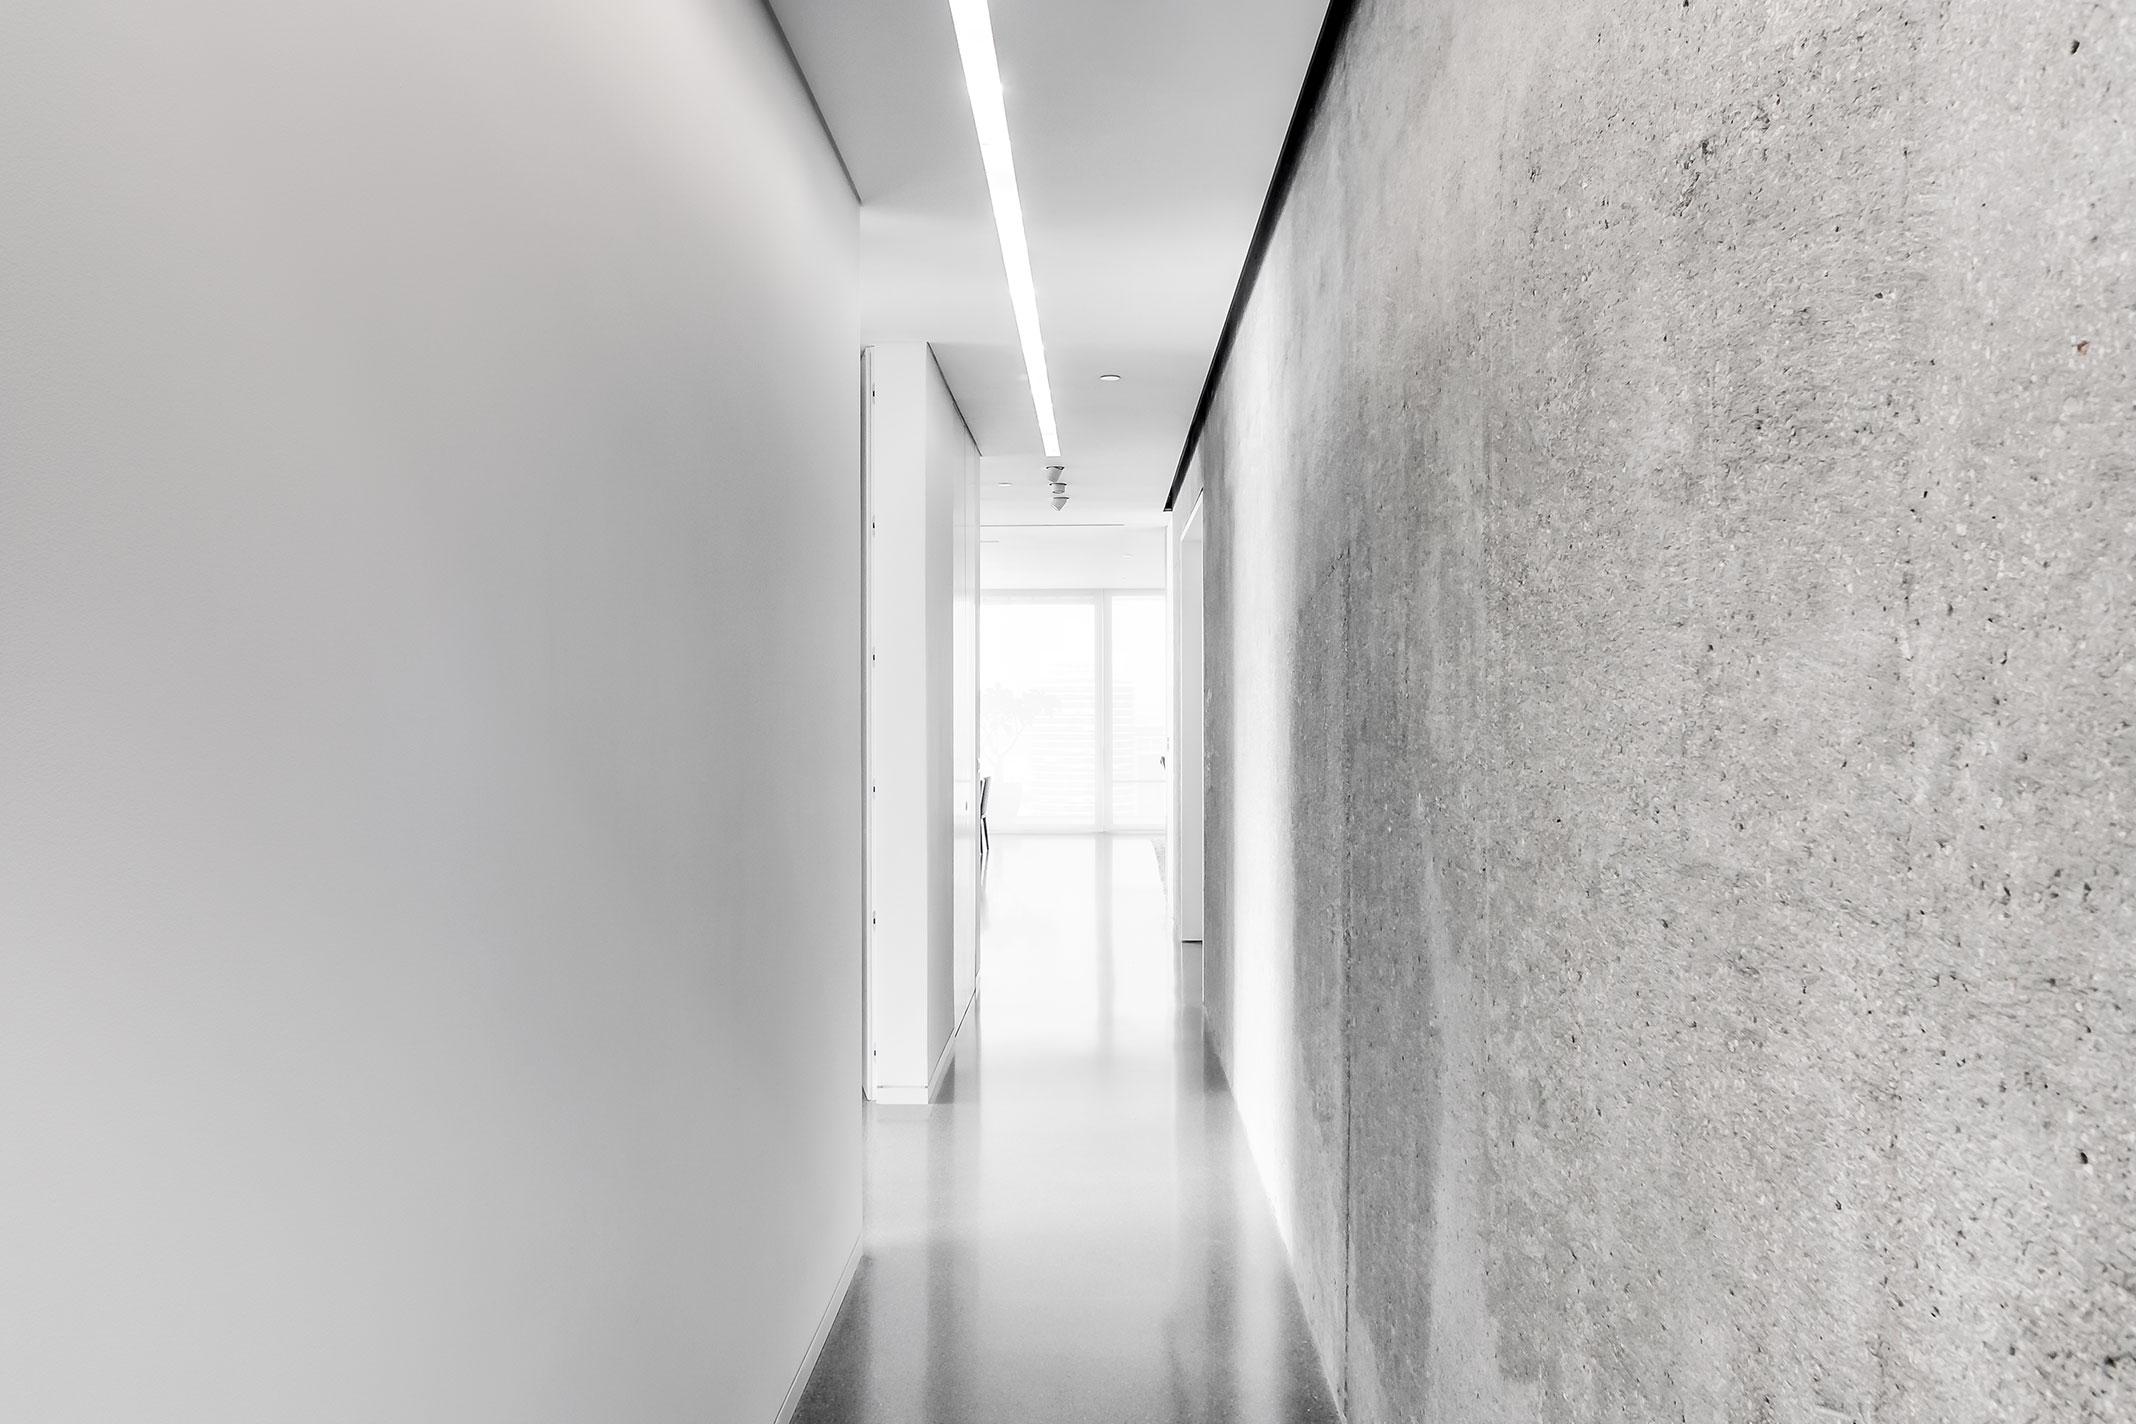 asaf lerman 225 apartment tel aviv12 Penthouse in Tel Aviv by Asaf Lerman Architects